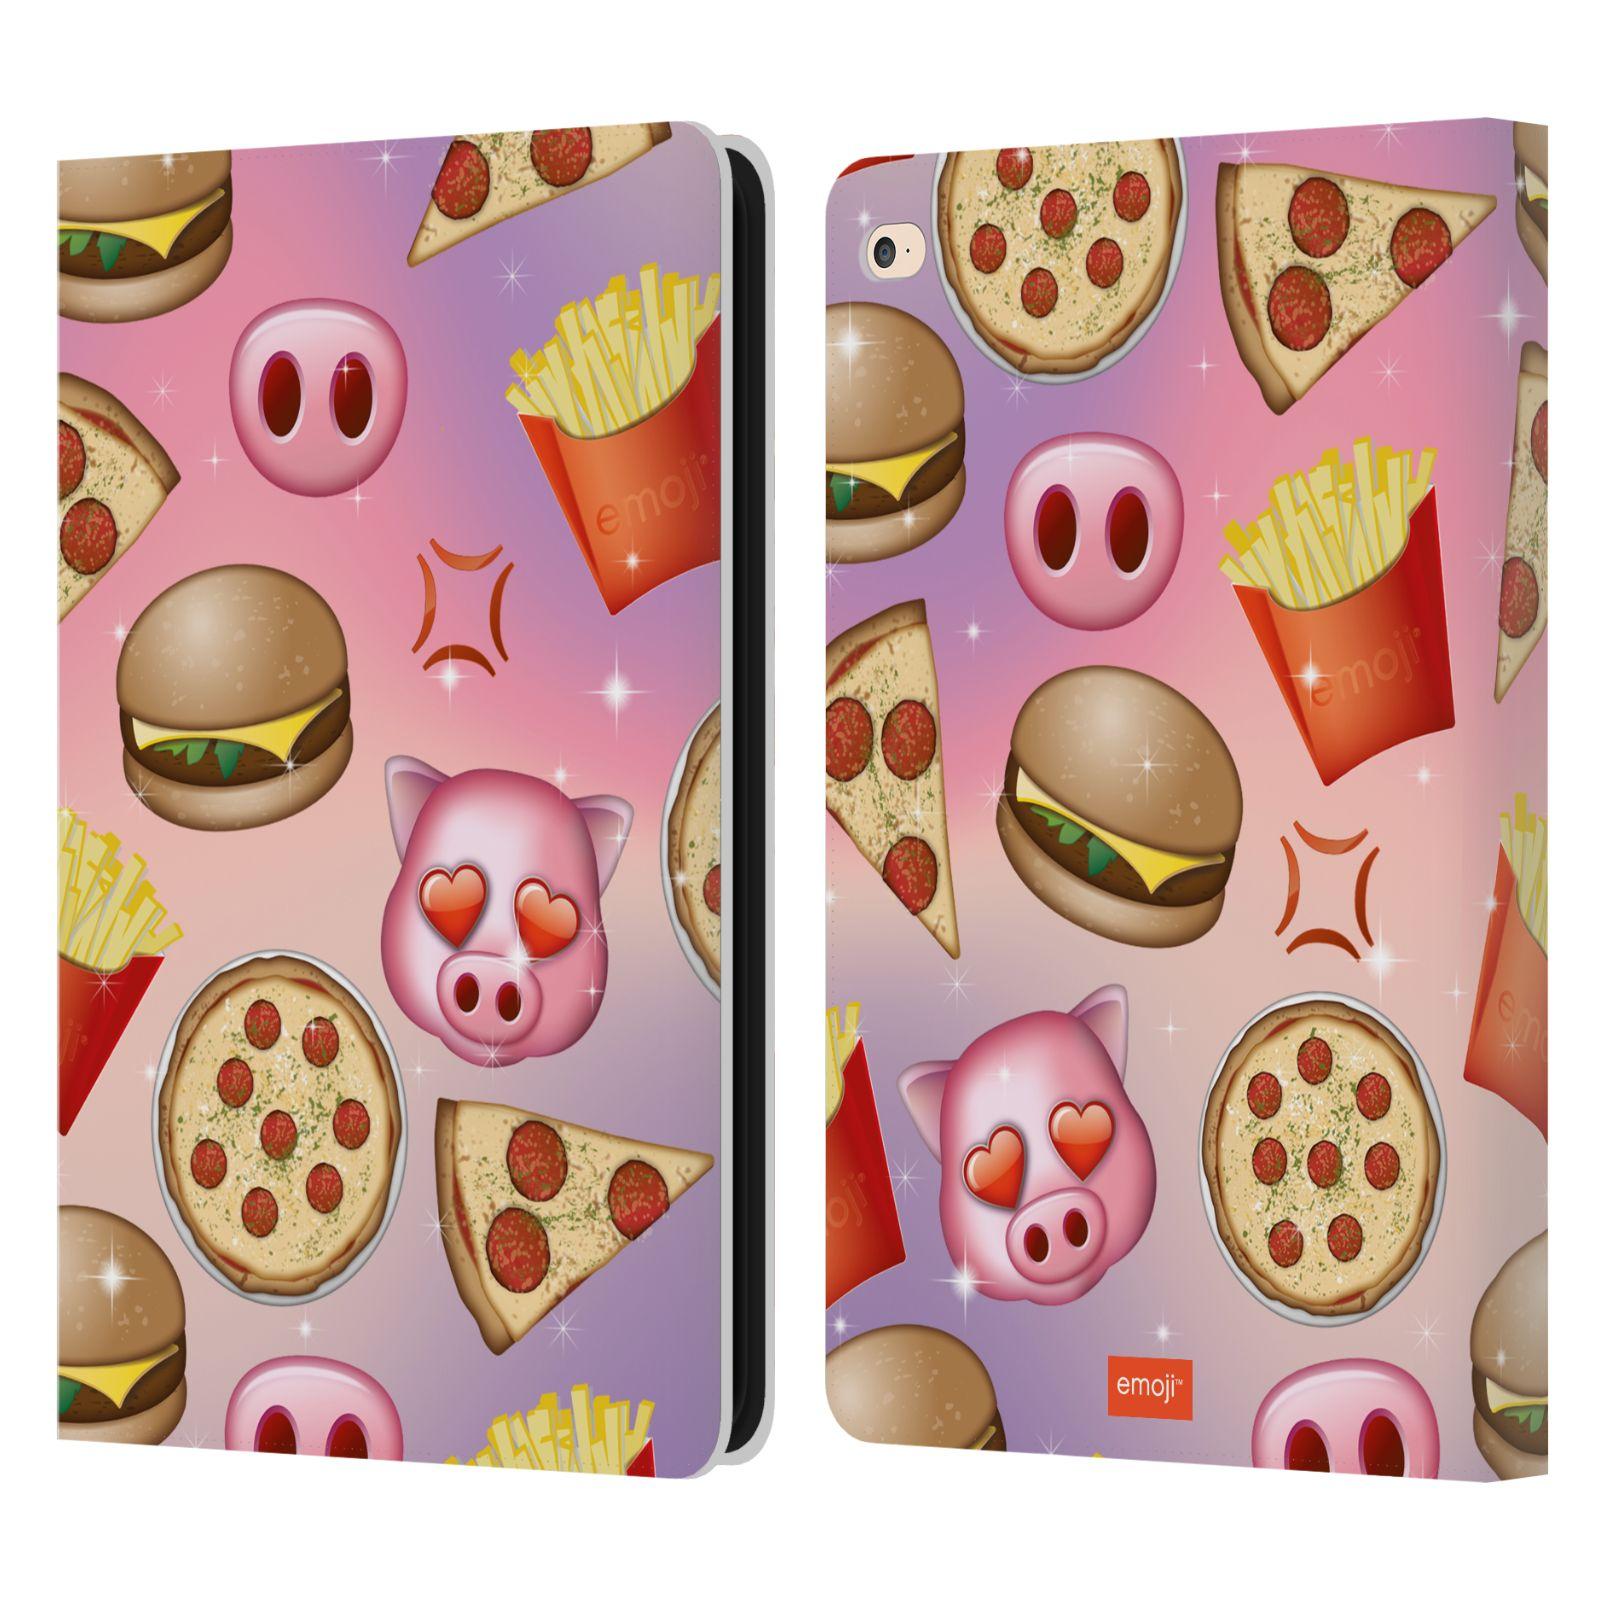 Diy Emoji Book Cover : Official emoji patterns leather book wallet case cover for